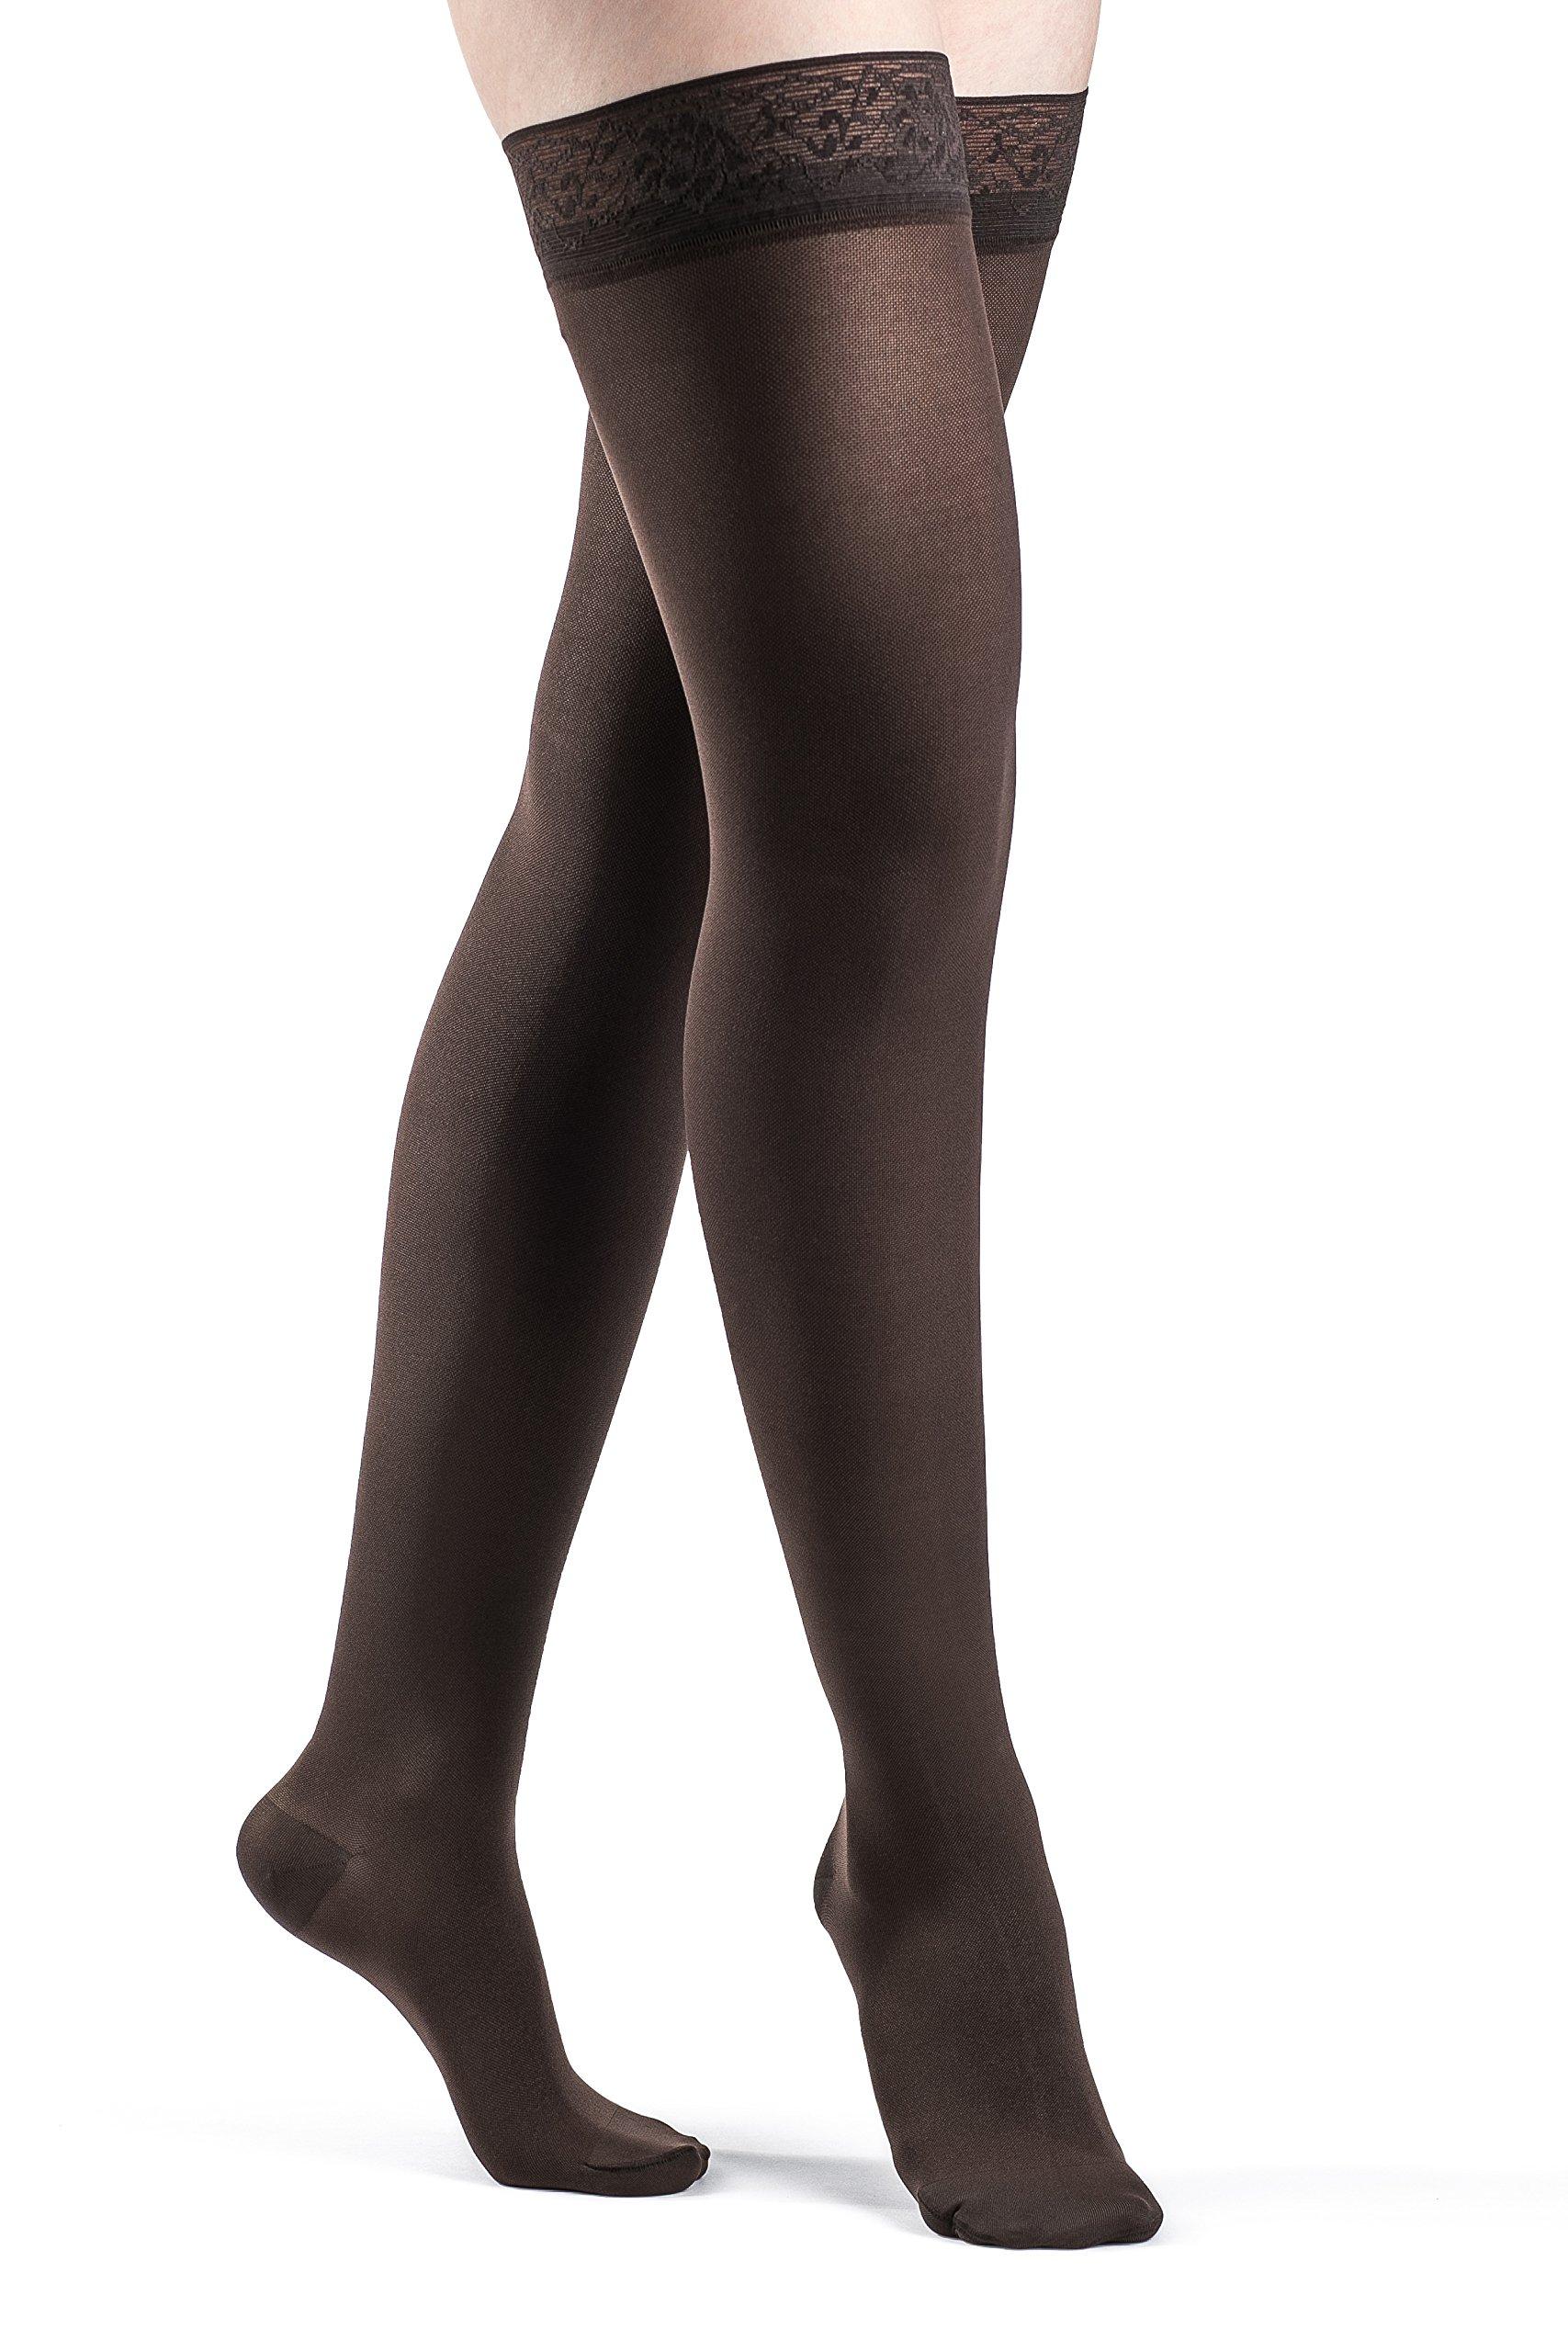 SIGVARIS Women's SOFT OPAQUE 840 Closed Toe Thigh High w/ Grip-Top 20-30mmHg